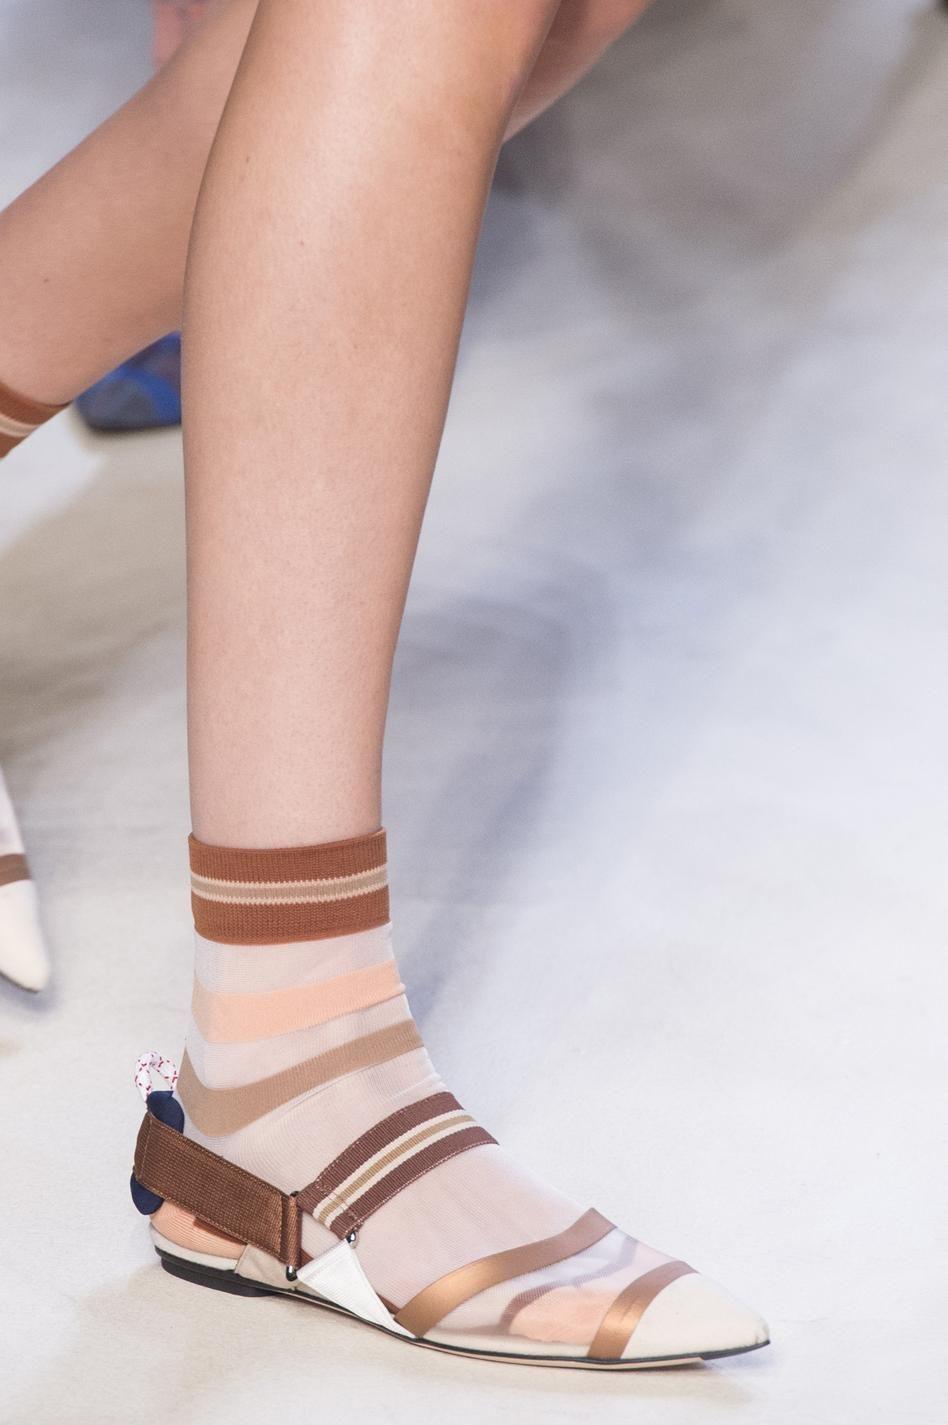 d fil fendi printemps t 2018 pr t porter la pasi n por los zapatos sandalias huarache. Black Bedroom Furniture Sets. Home Design Ideas